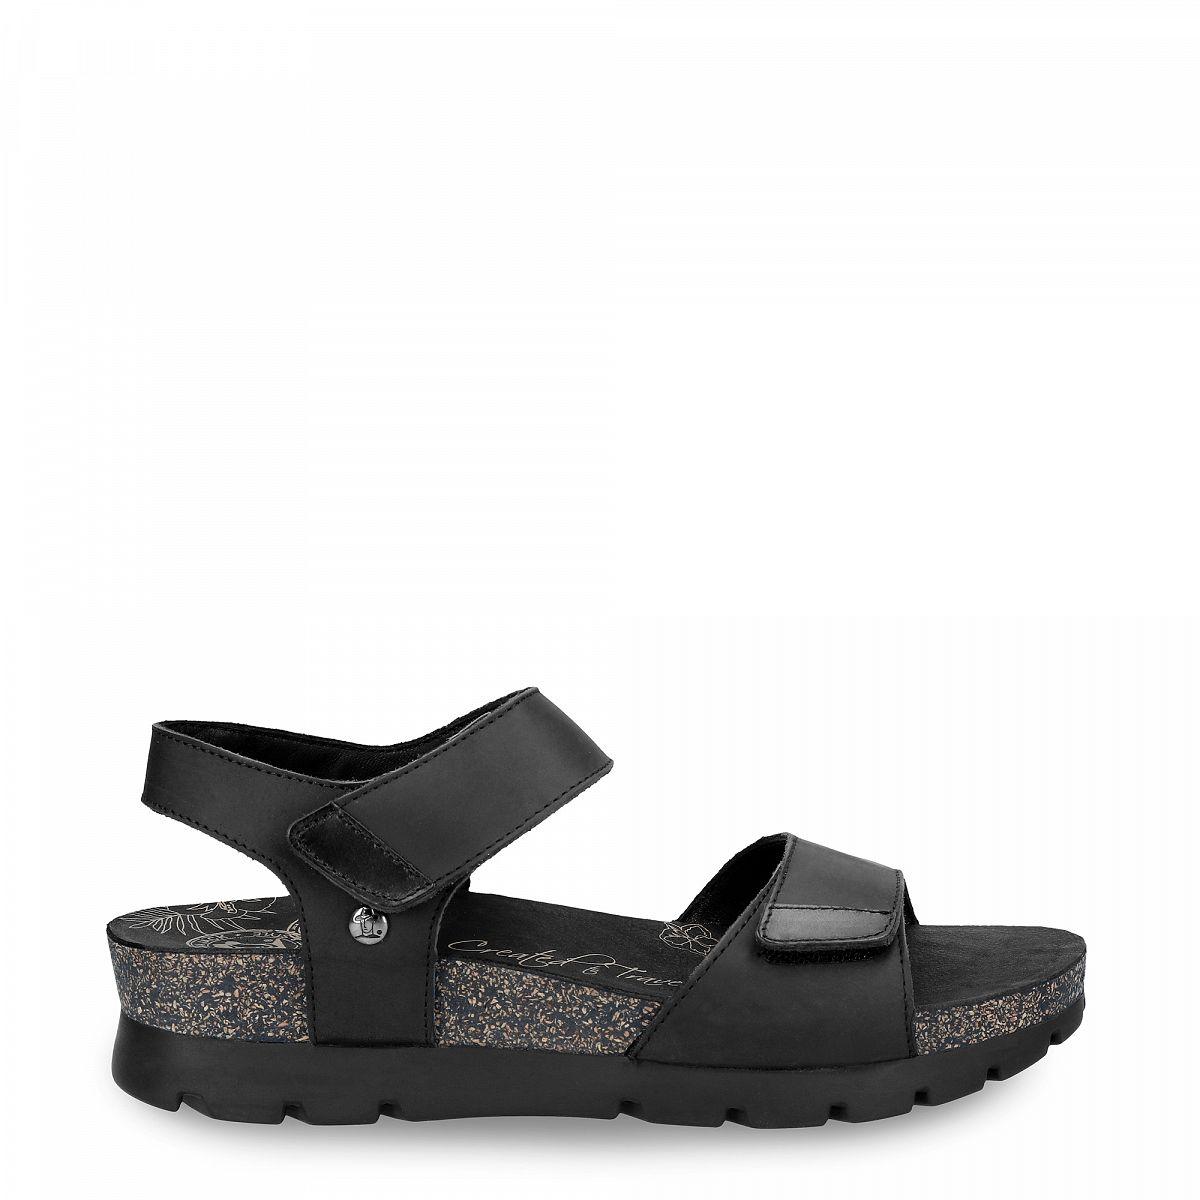 edffea31ade275 Women s sandals SCARLETT BASICS black